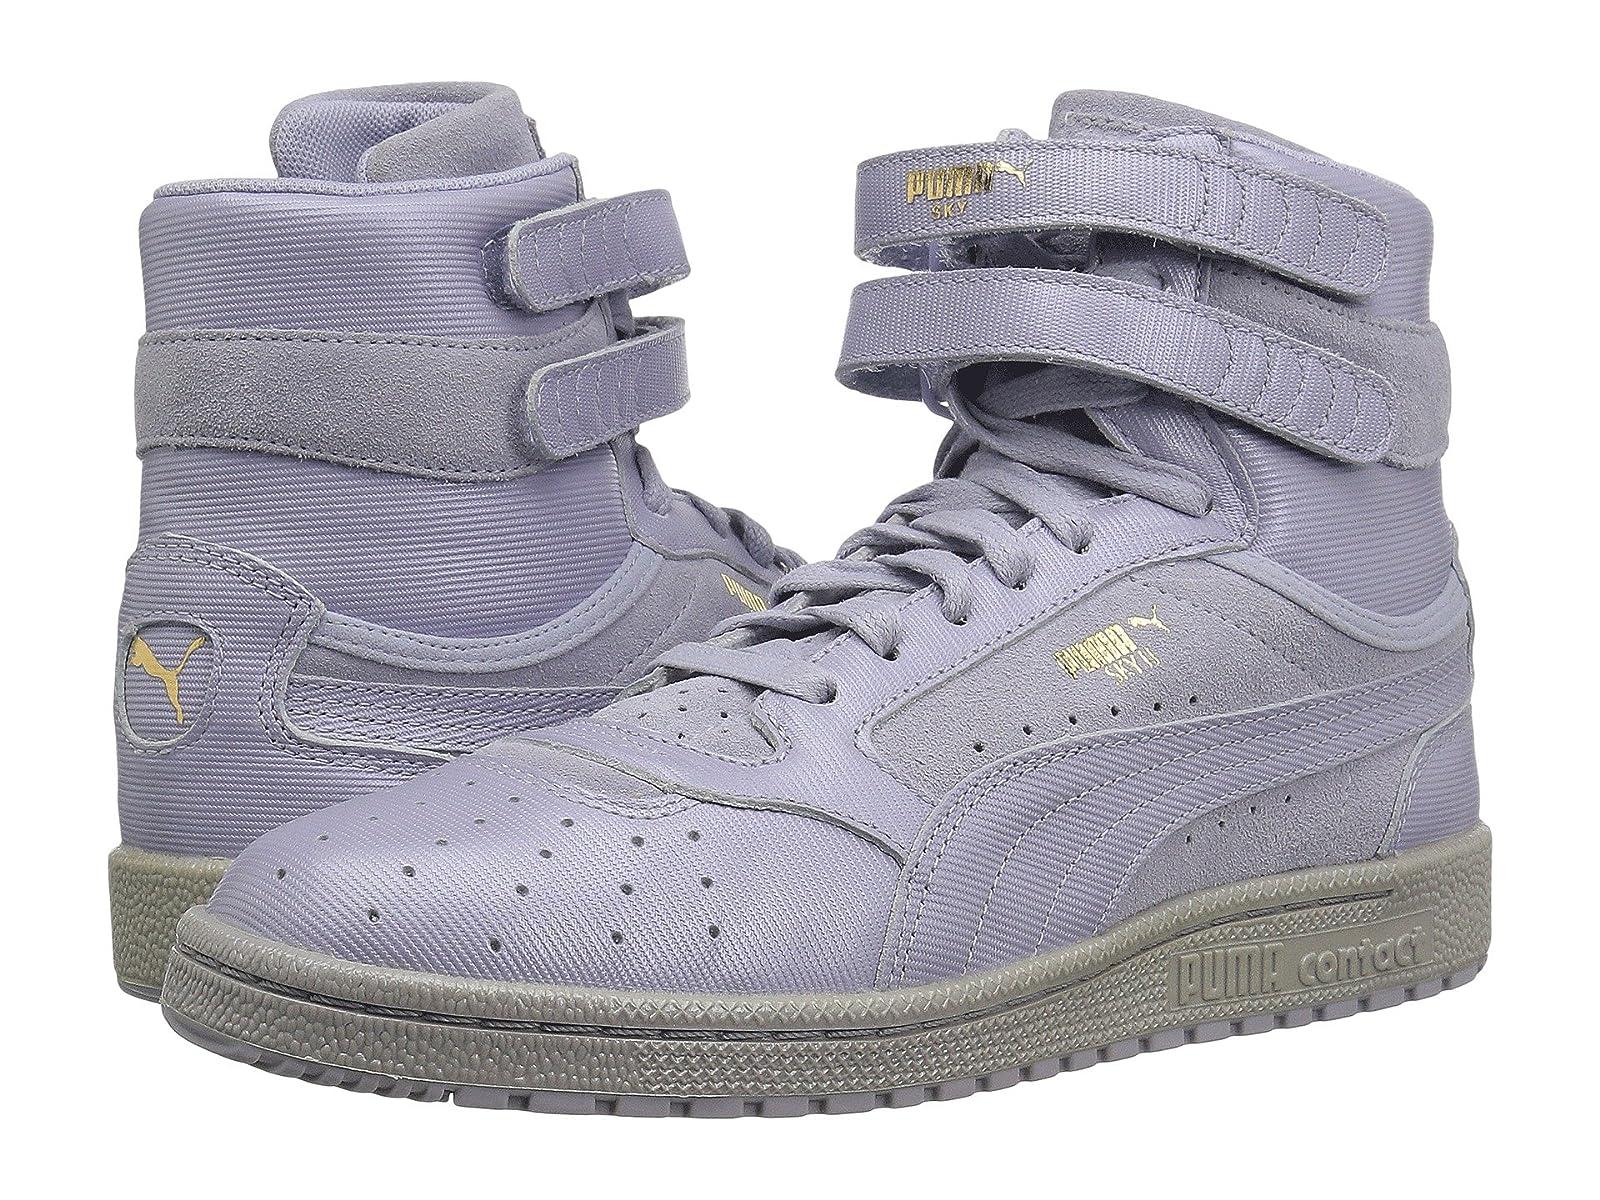 PUMA Sky II Hi AnodCheap and distinctive eye-catching shoes